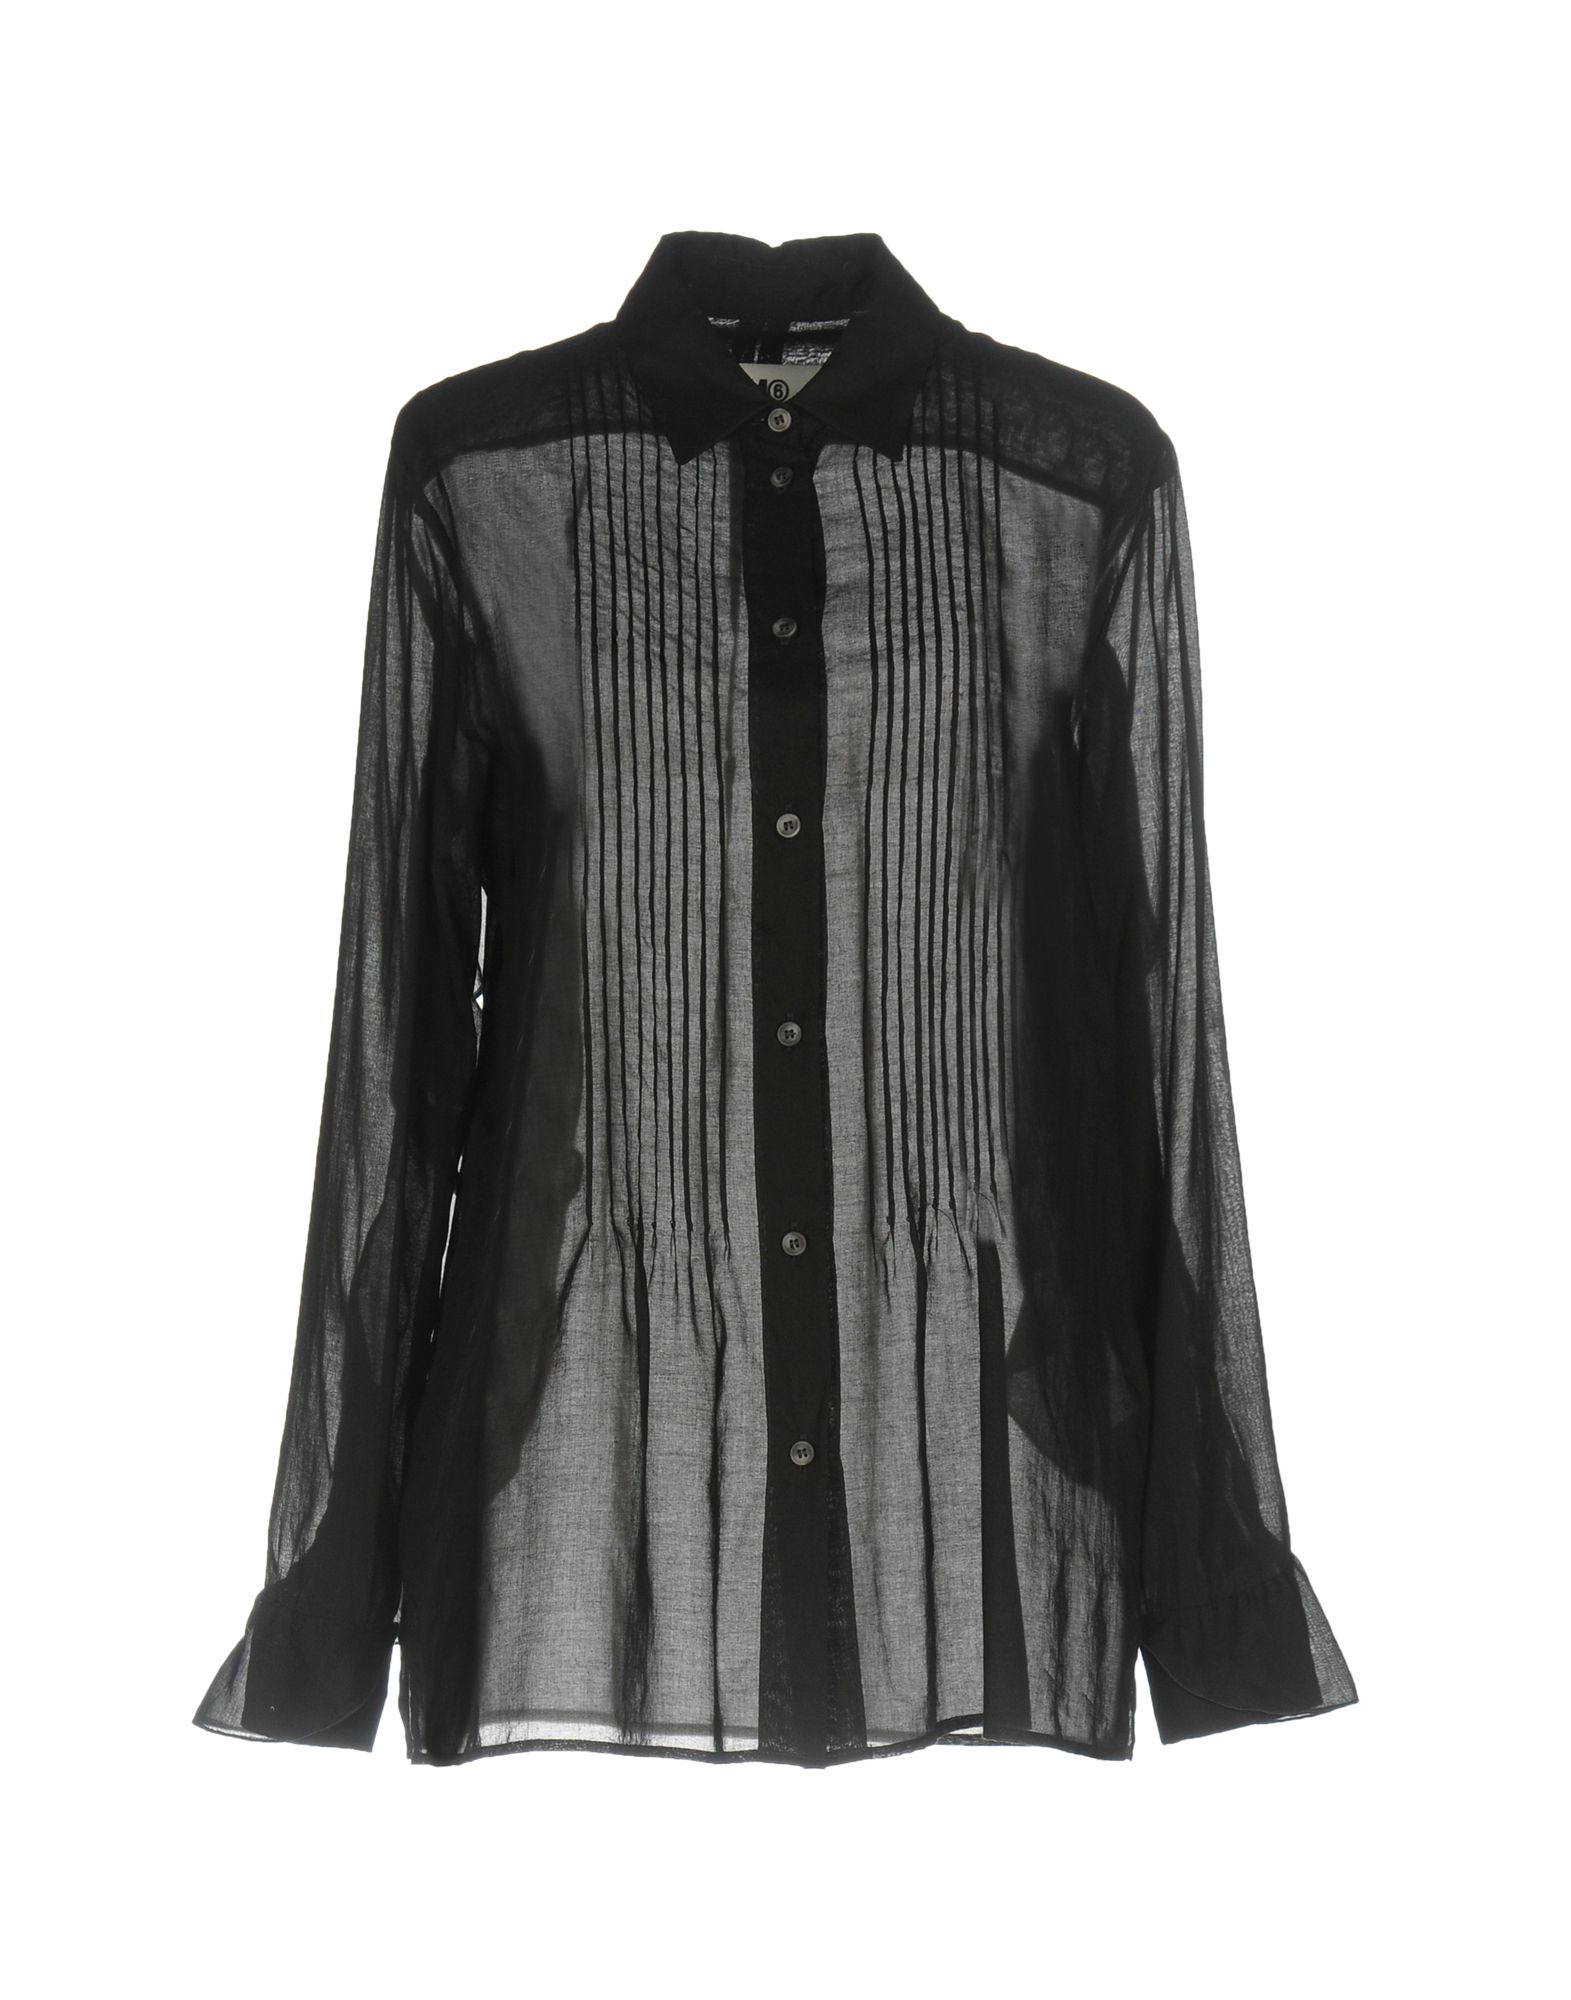 Camicie E Bluse Tinta Unita Mm6 Maison Margiela Donna - Acquista online su EK2lFdf8U6